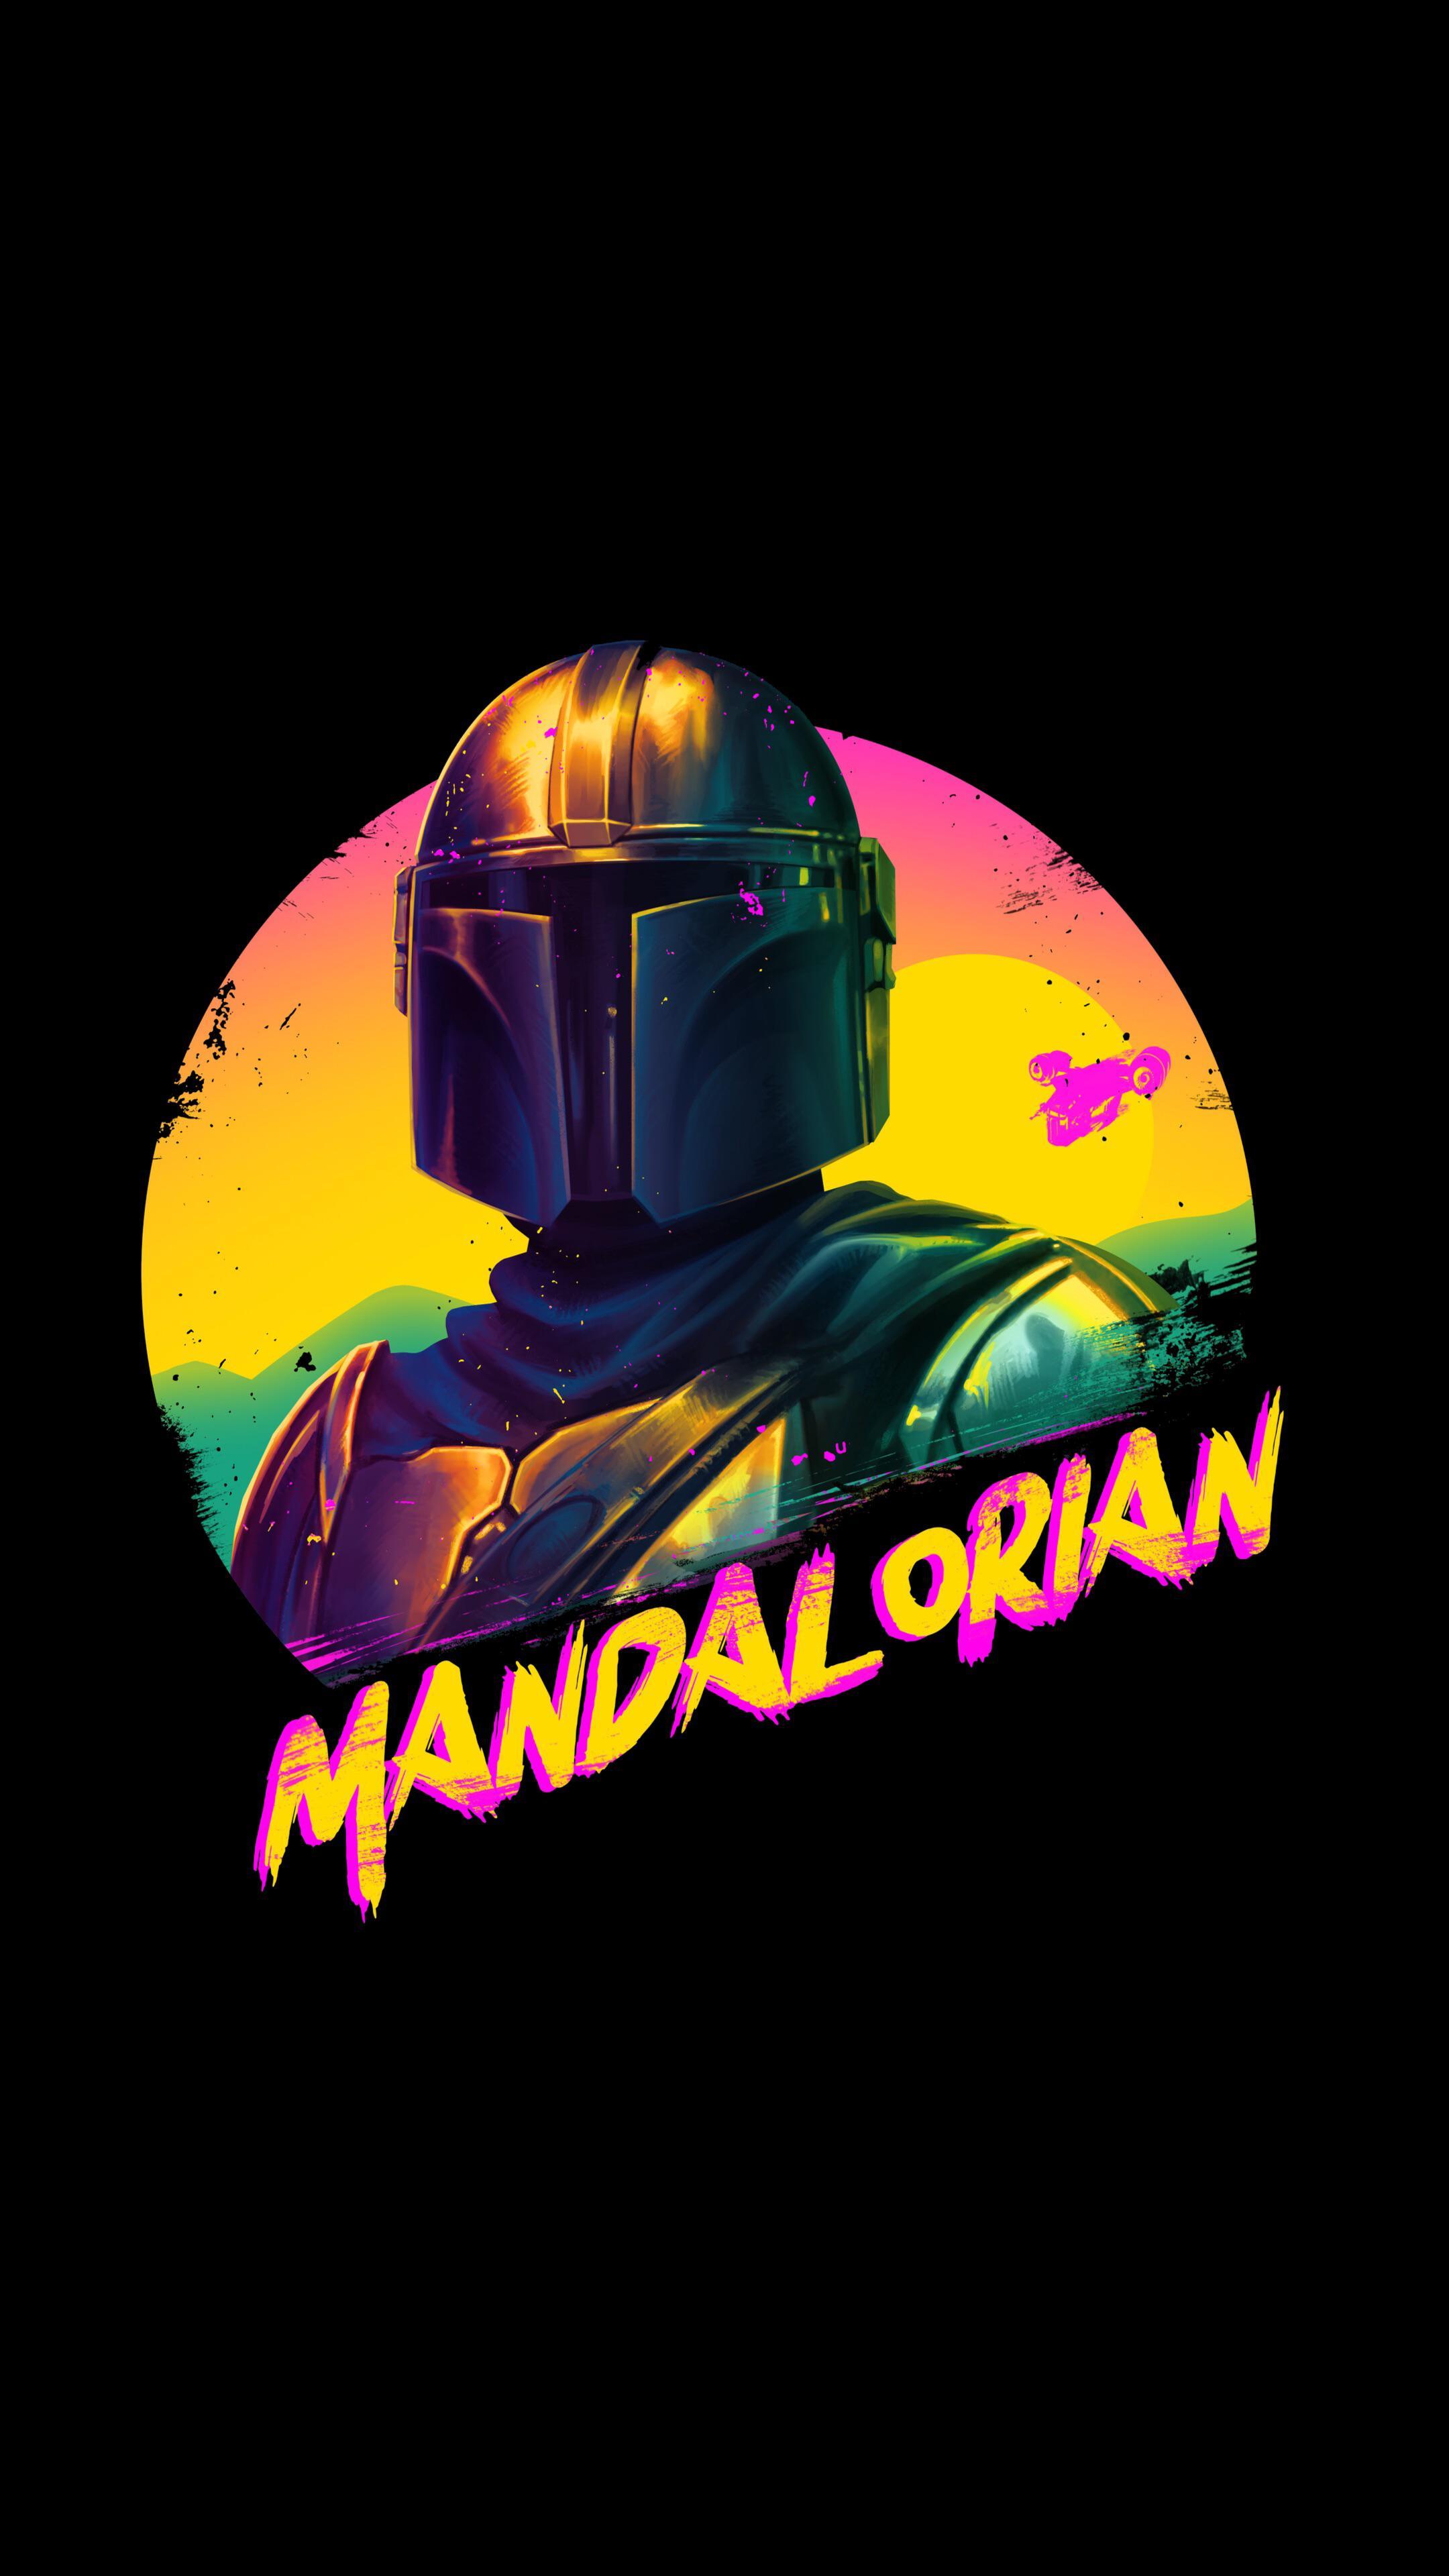 The Mandalorian wallpaper OLED iPhone idownloadblog 90s retro mando